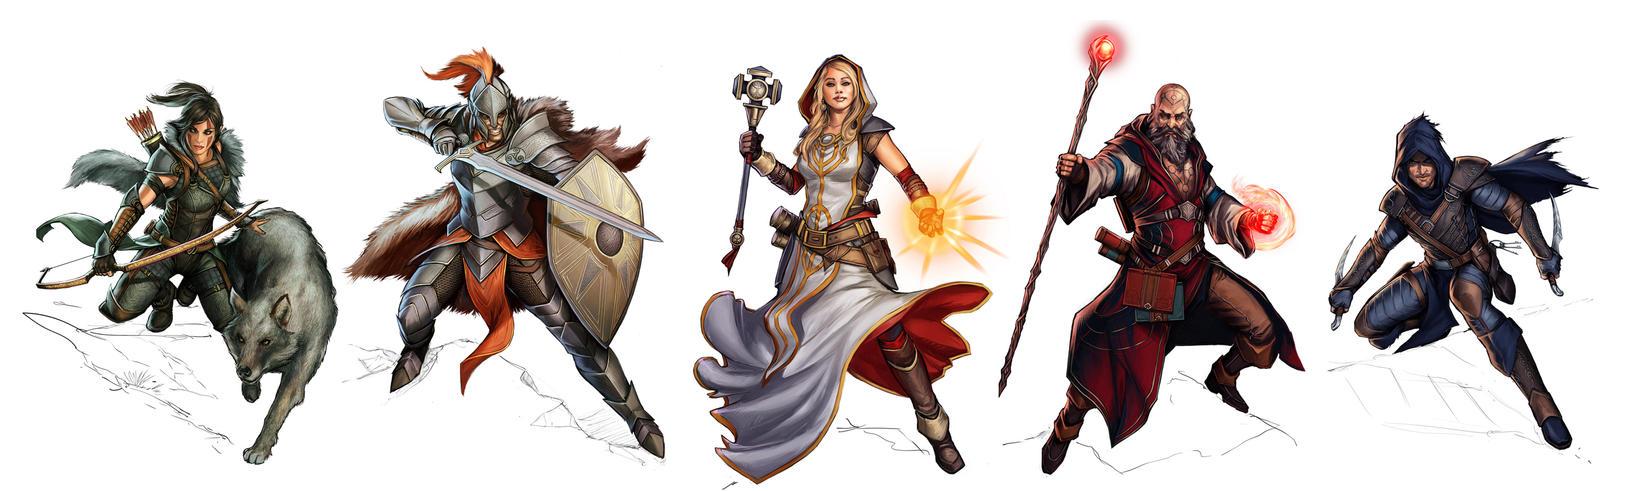 Characters 3 by YamaOrce